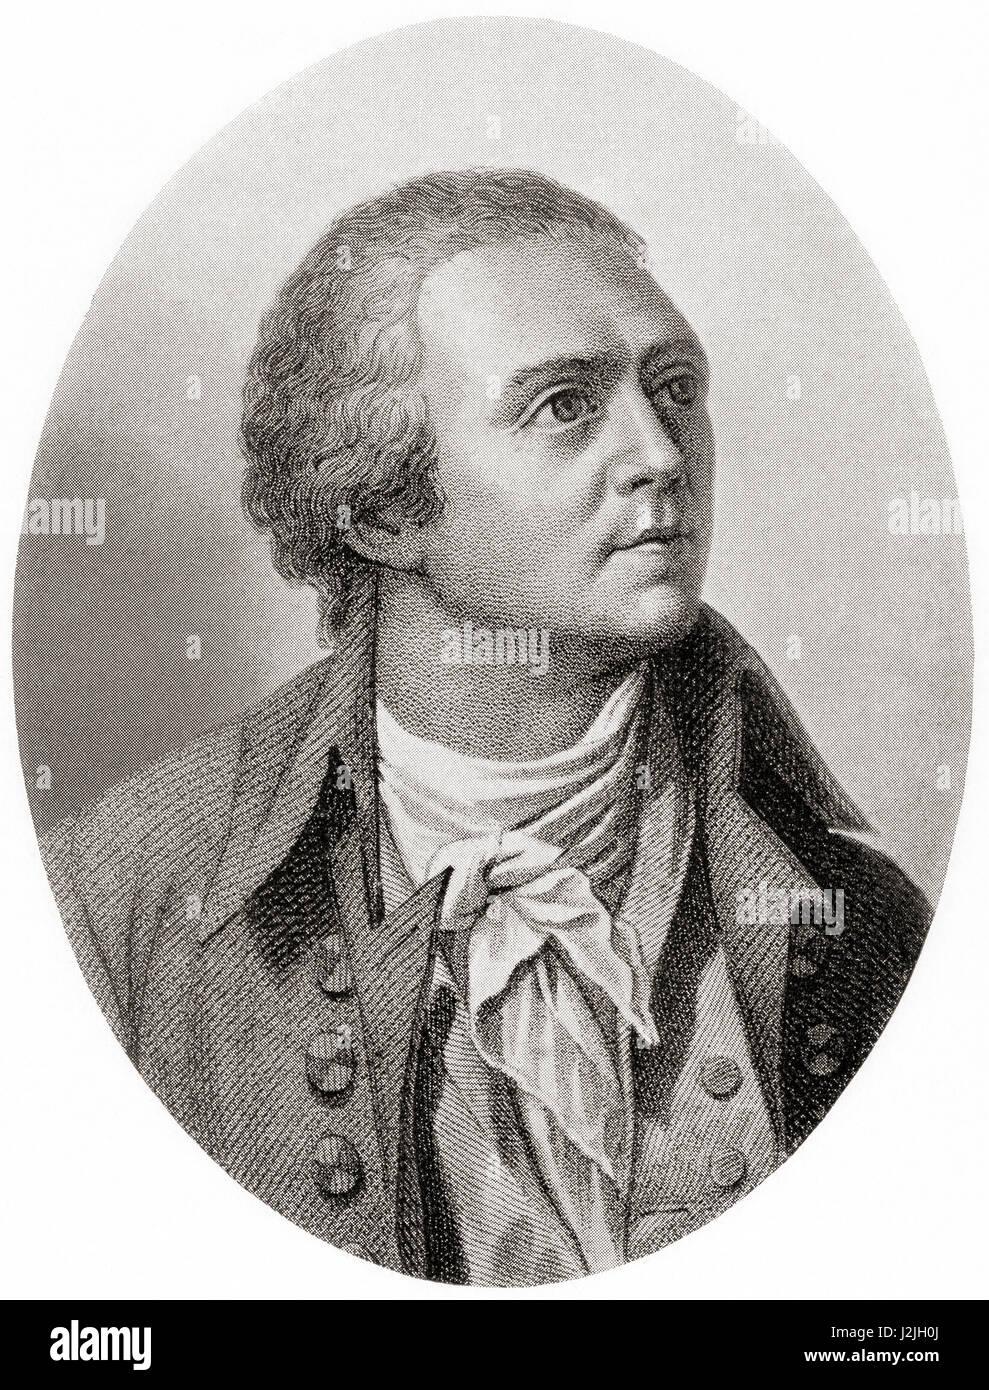 Horace-Bénédict de Saussure, 1740 – 1799.  Genevan and savoyan geologist, meteorologist, physicist, mountaineer - Stock Image